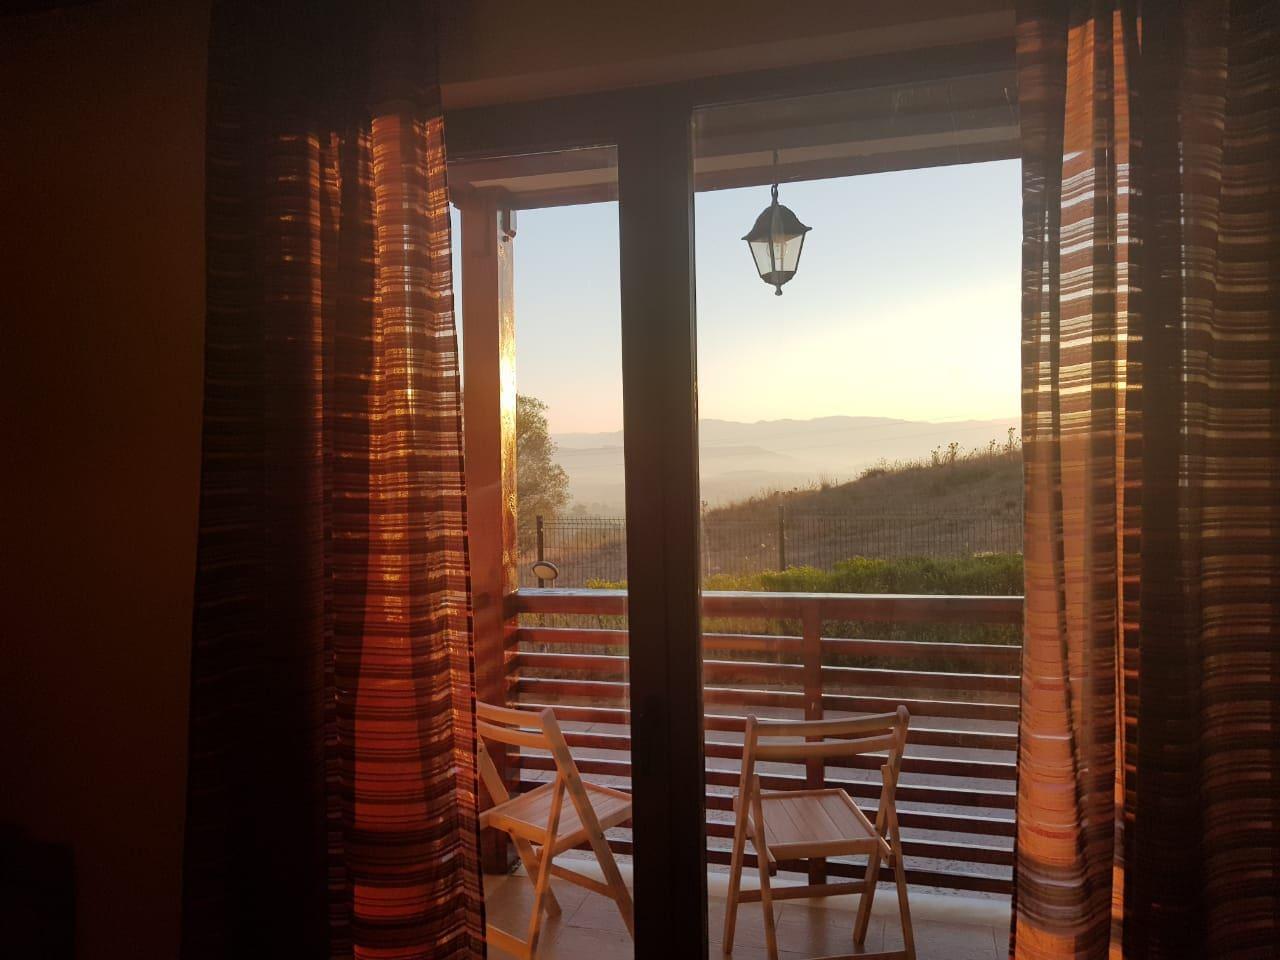 One of the inimitable sunrises